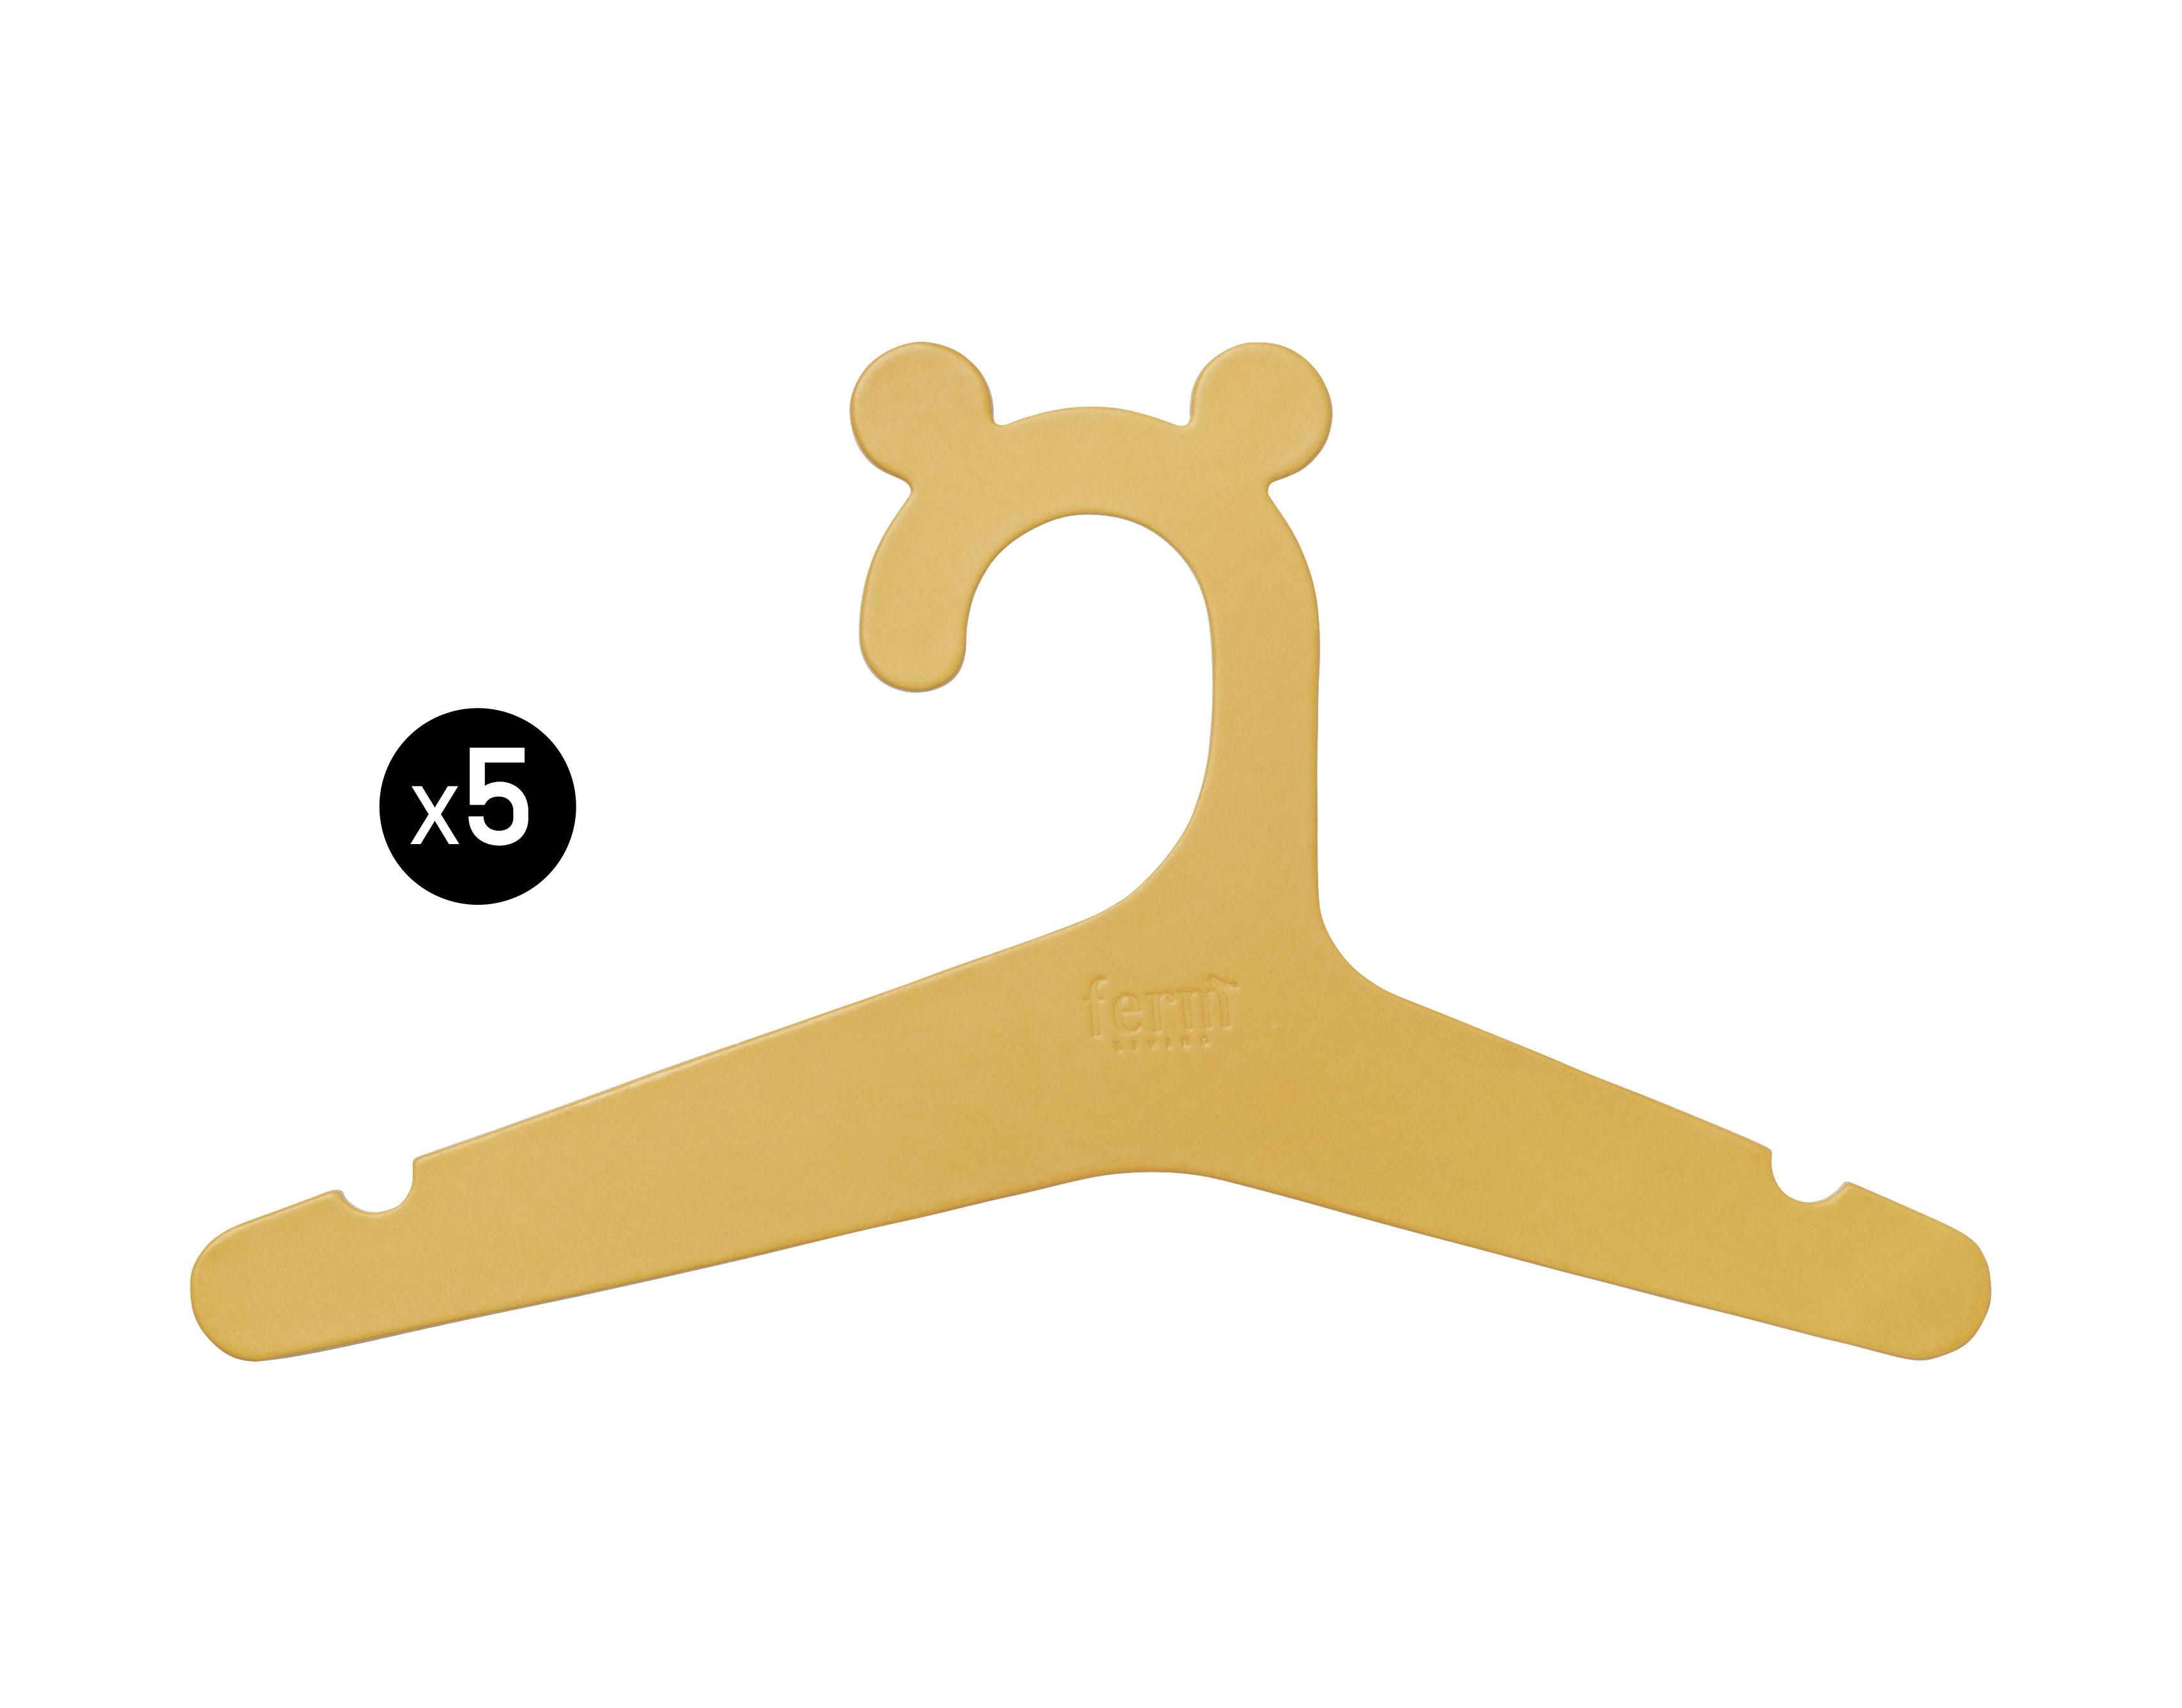 Möbel - Möbel für Kinder - Kids Kleiderbügel / aus recycelter Pappe - 5er-Set - Ferm Living - Currygelb - Carton recyclé